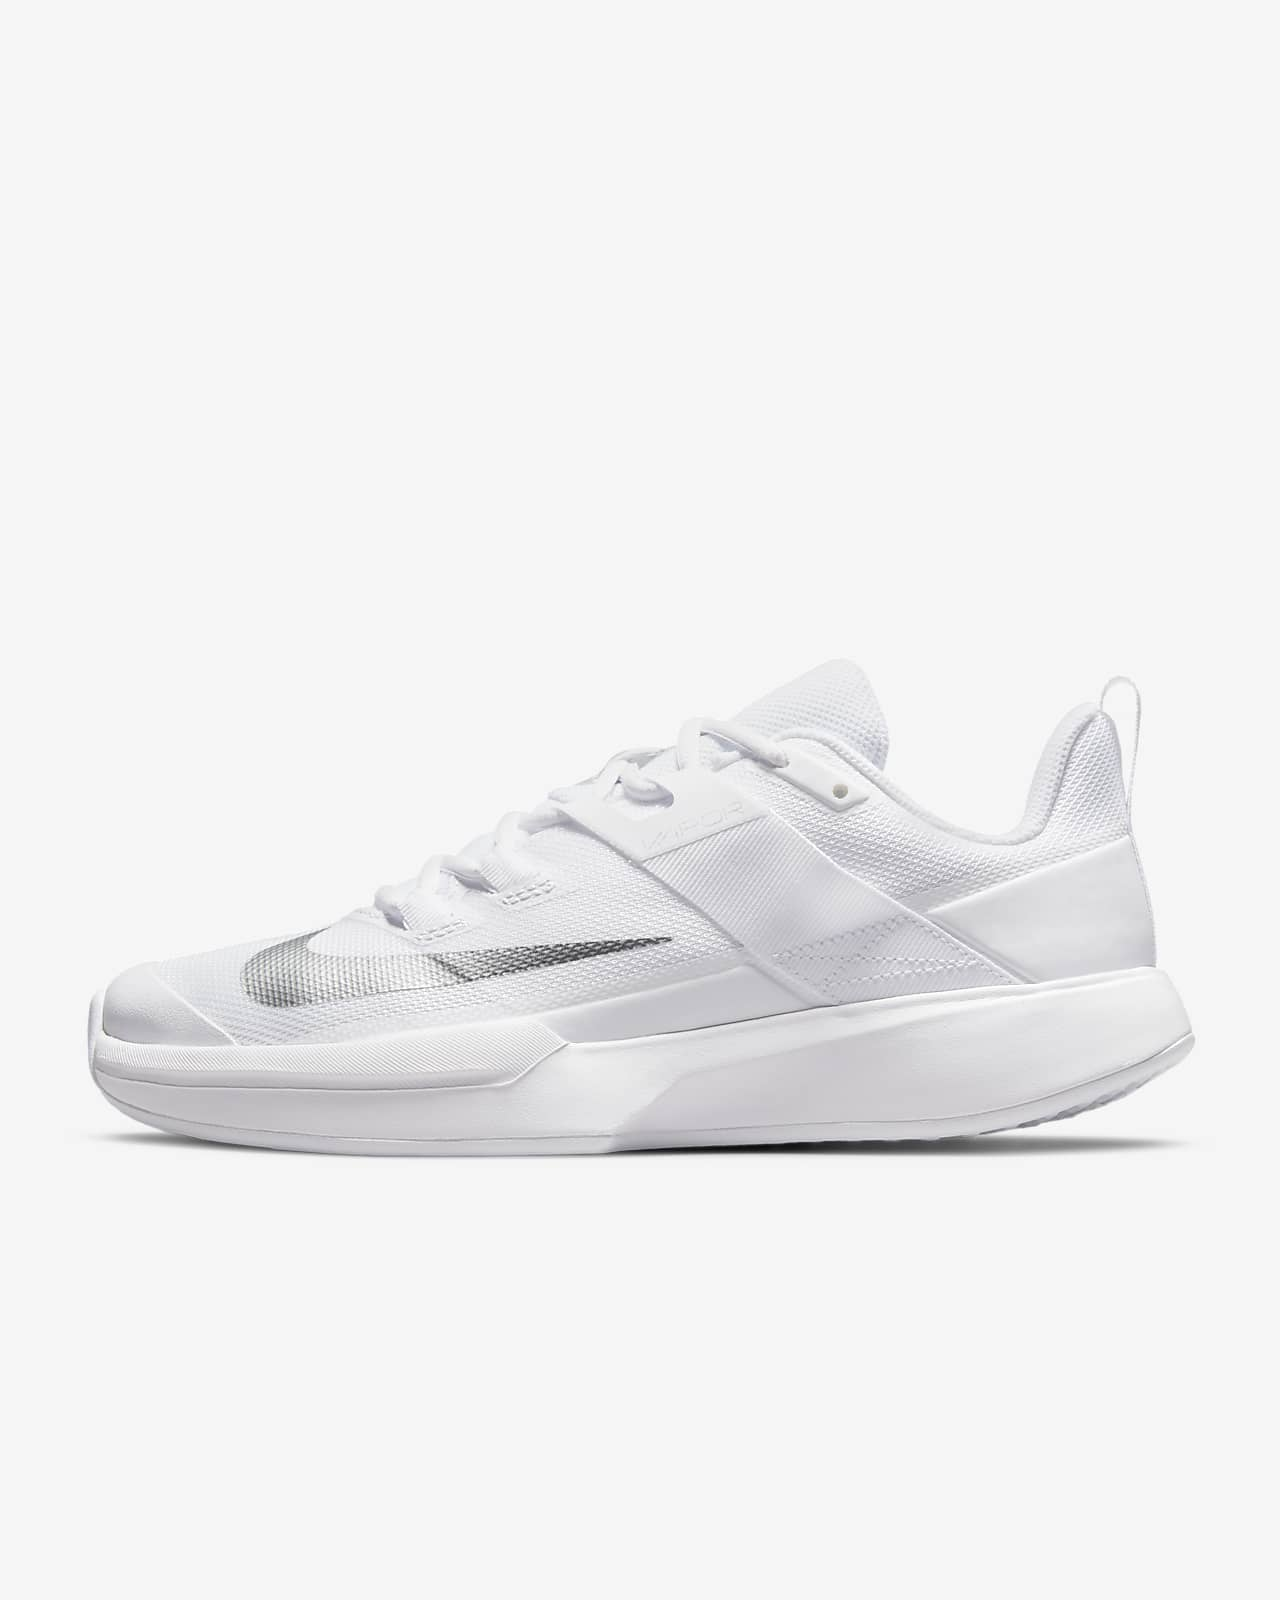 Calzado de tenis para cancha dura para mujer NikeCourt Vapor Lite